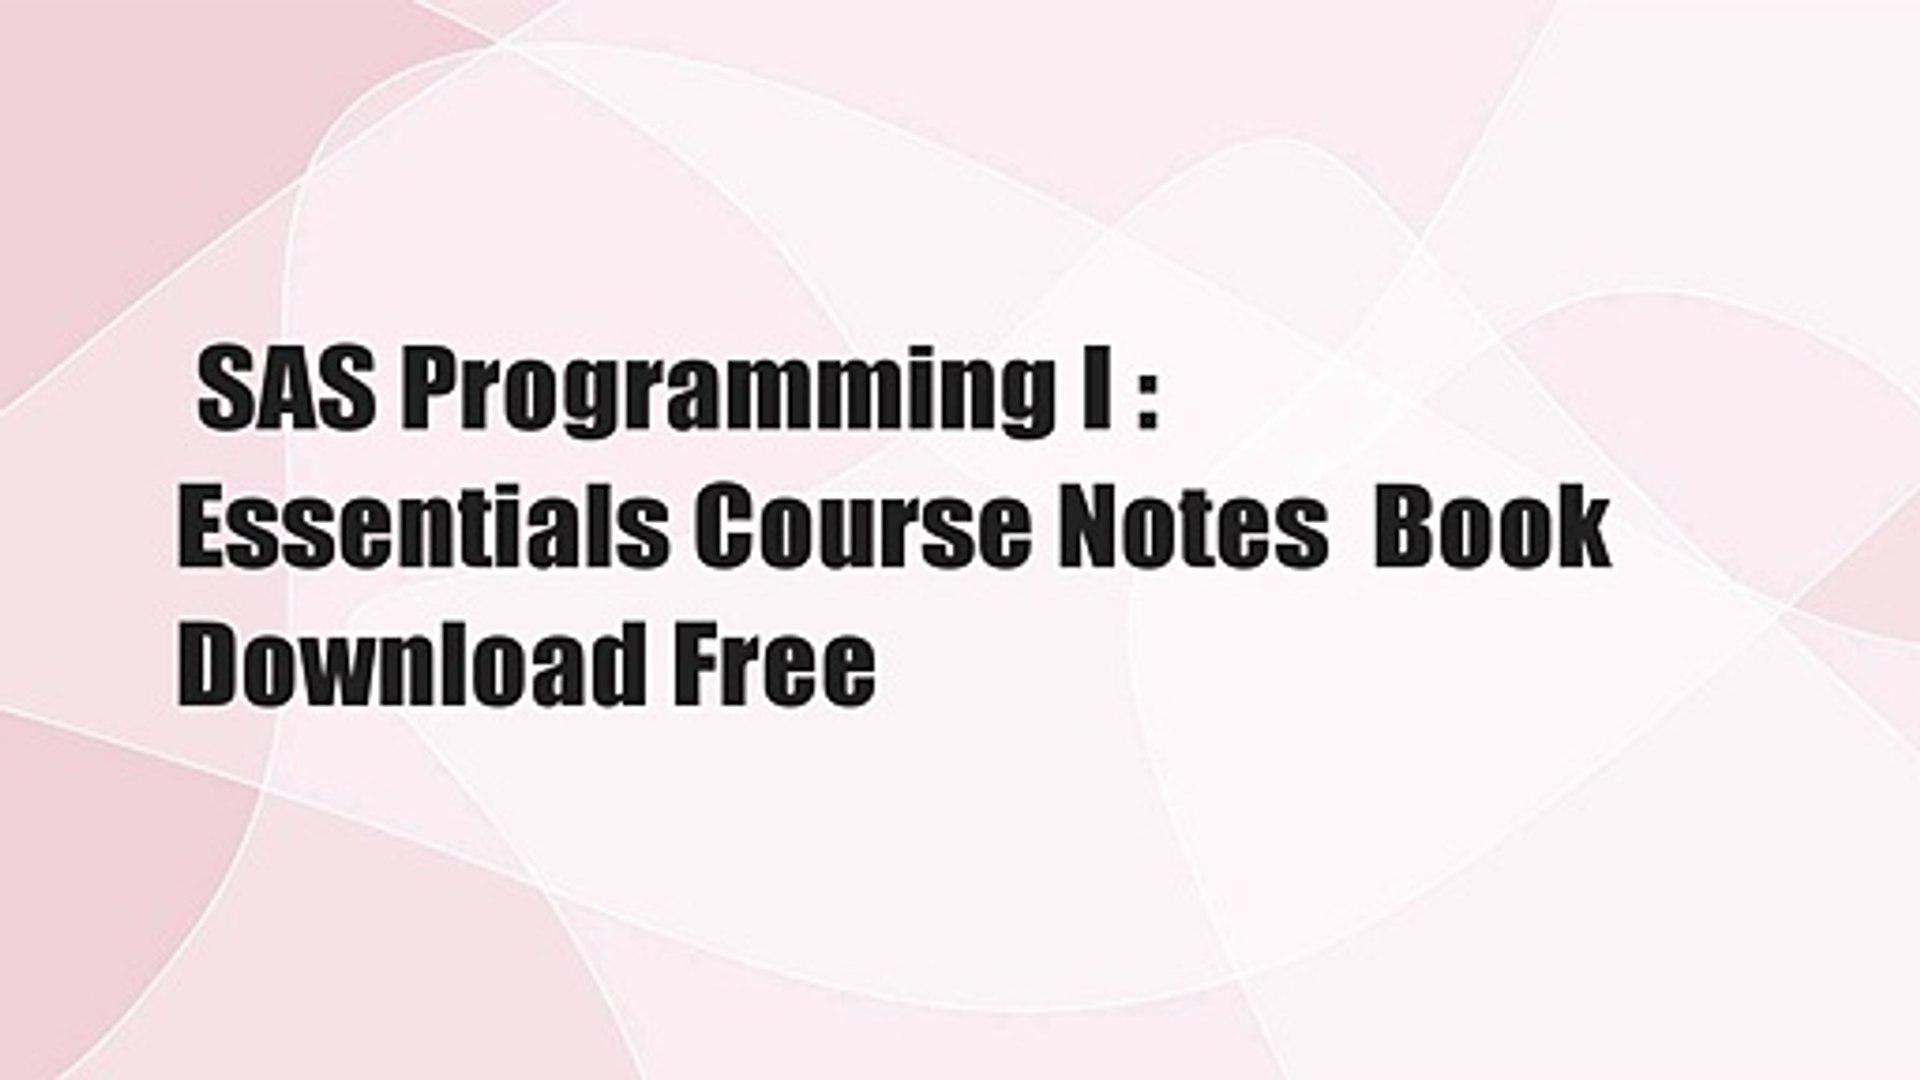 SAS Programming I : Essentials Course Notes Book Download Free